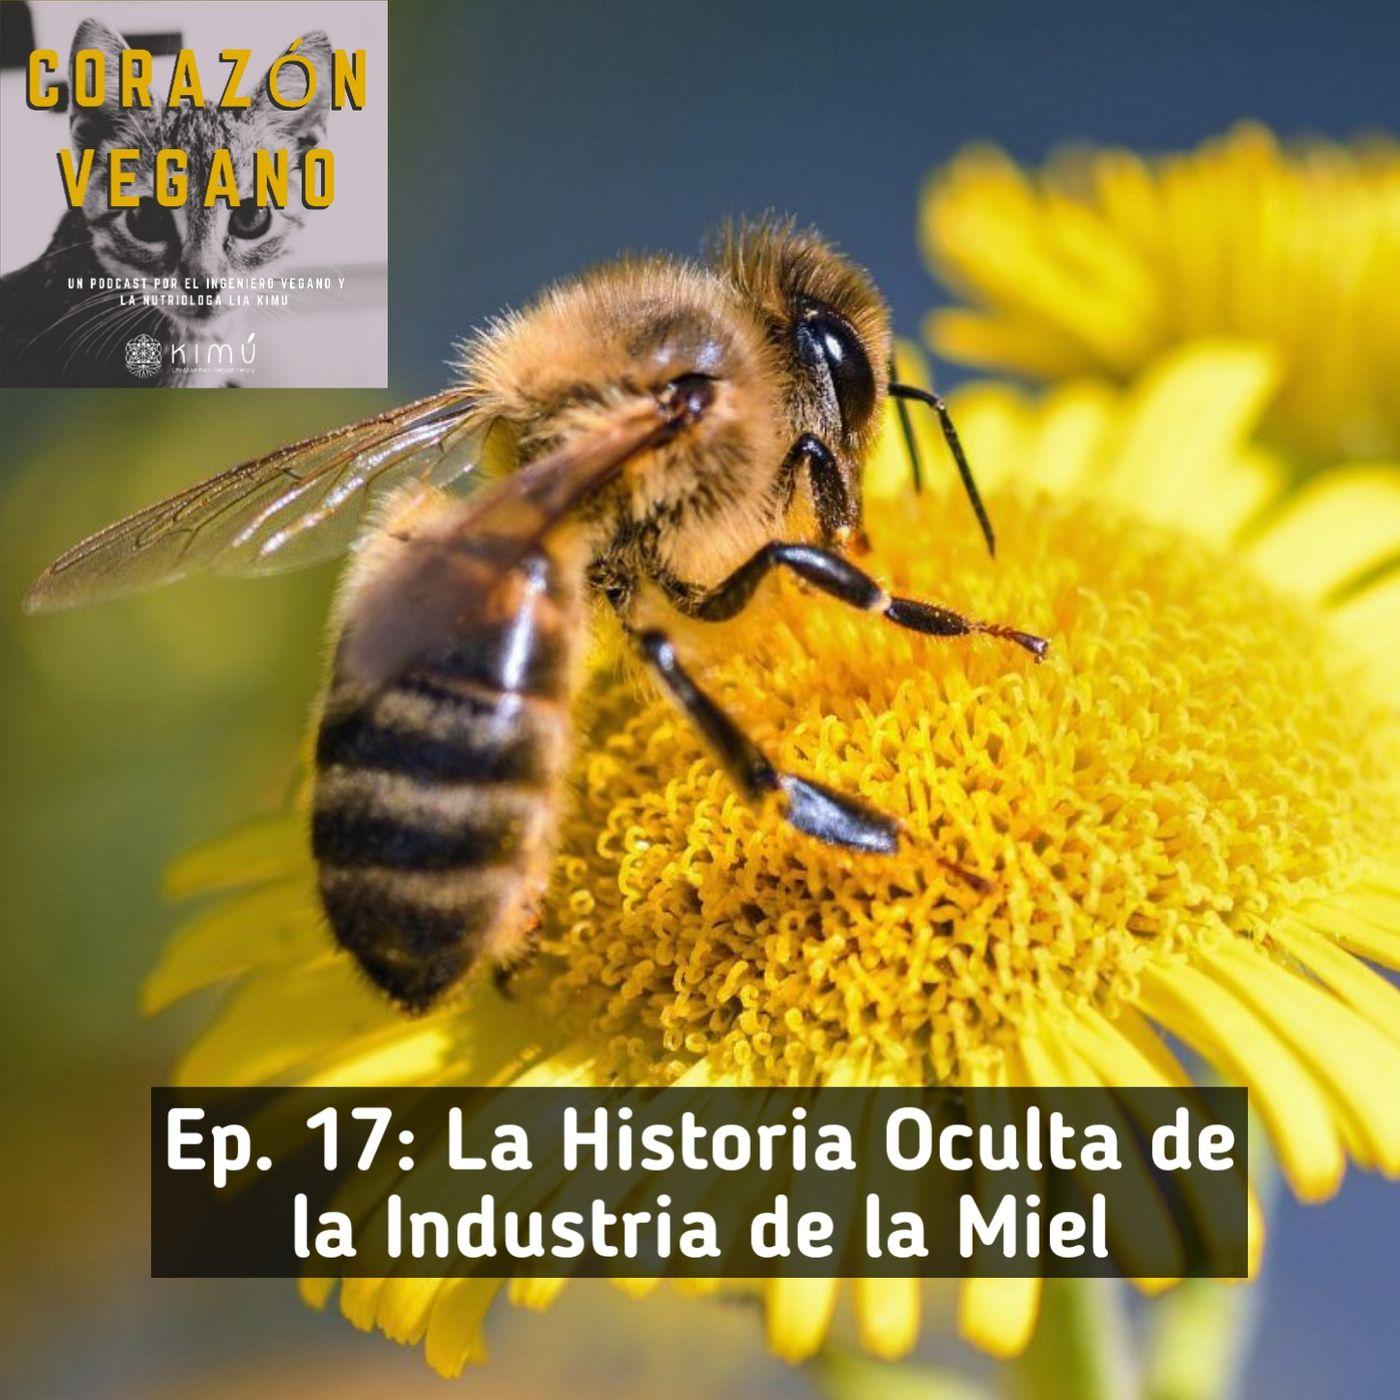 Ep. 17: La Historia Oculta de La Industria de la Miel